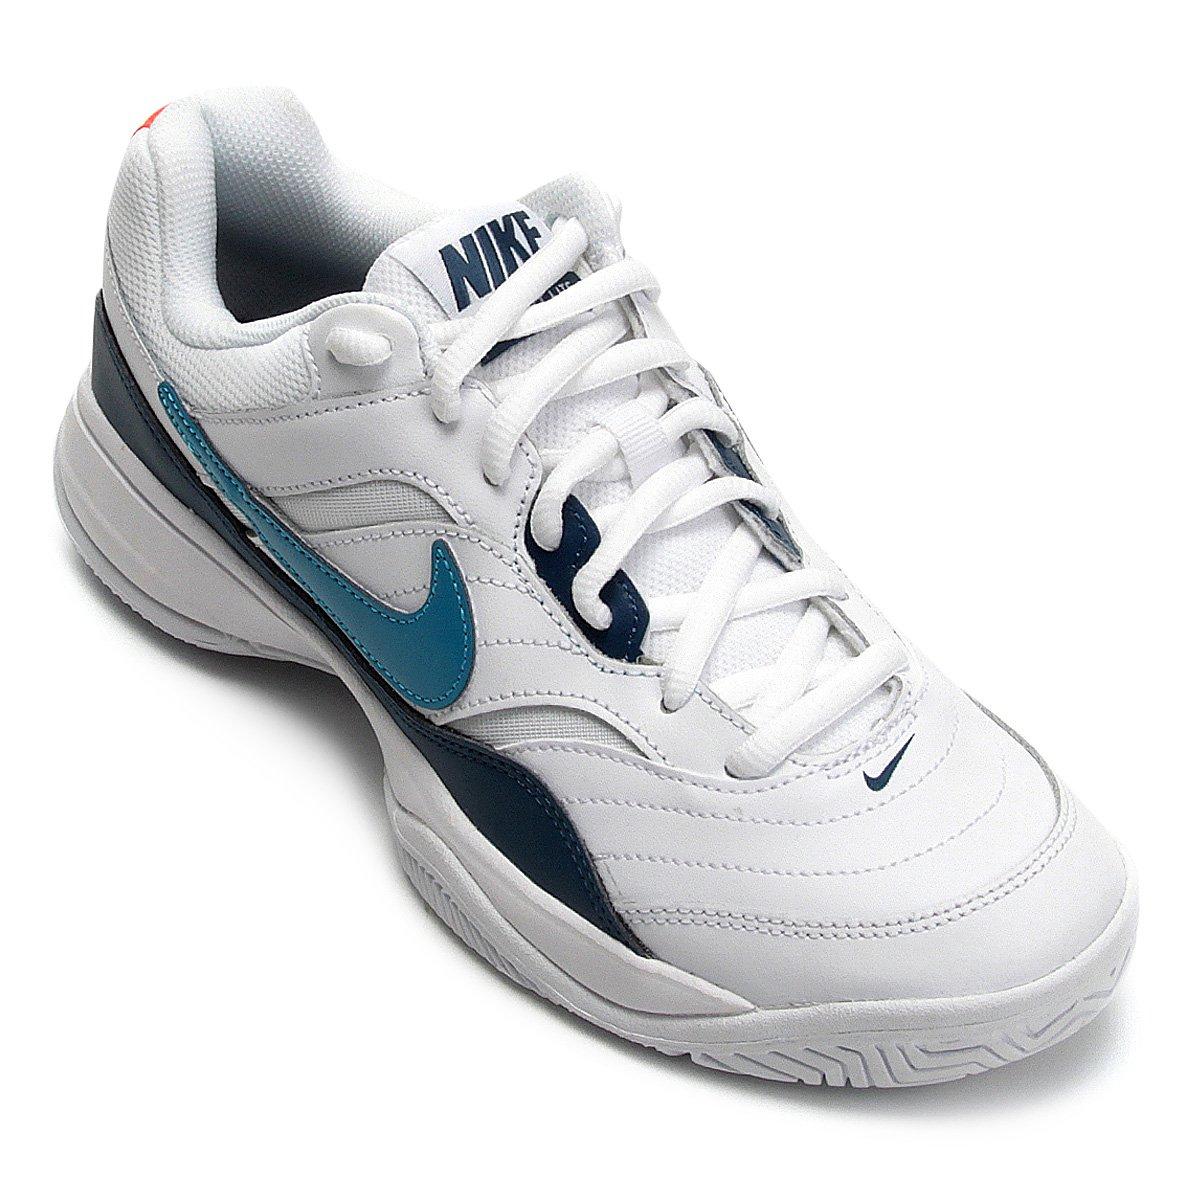 f9624cb4b352d Tênis Nike Court Lite Masculino - Branco e Verde - Compre Agora ...